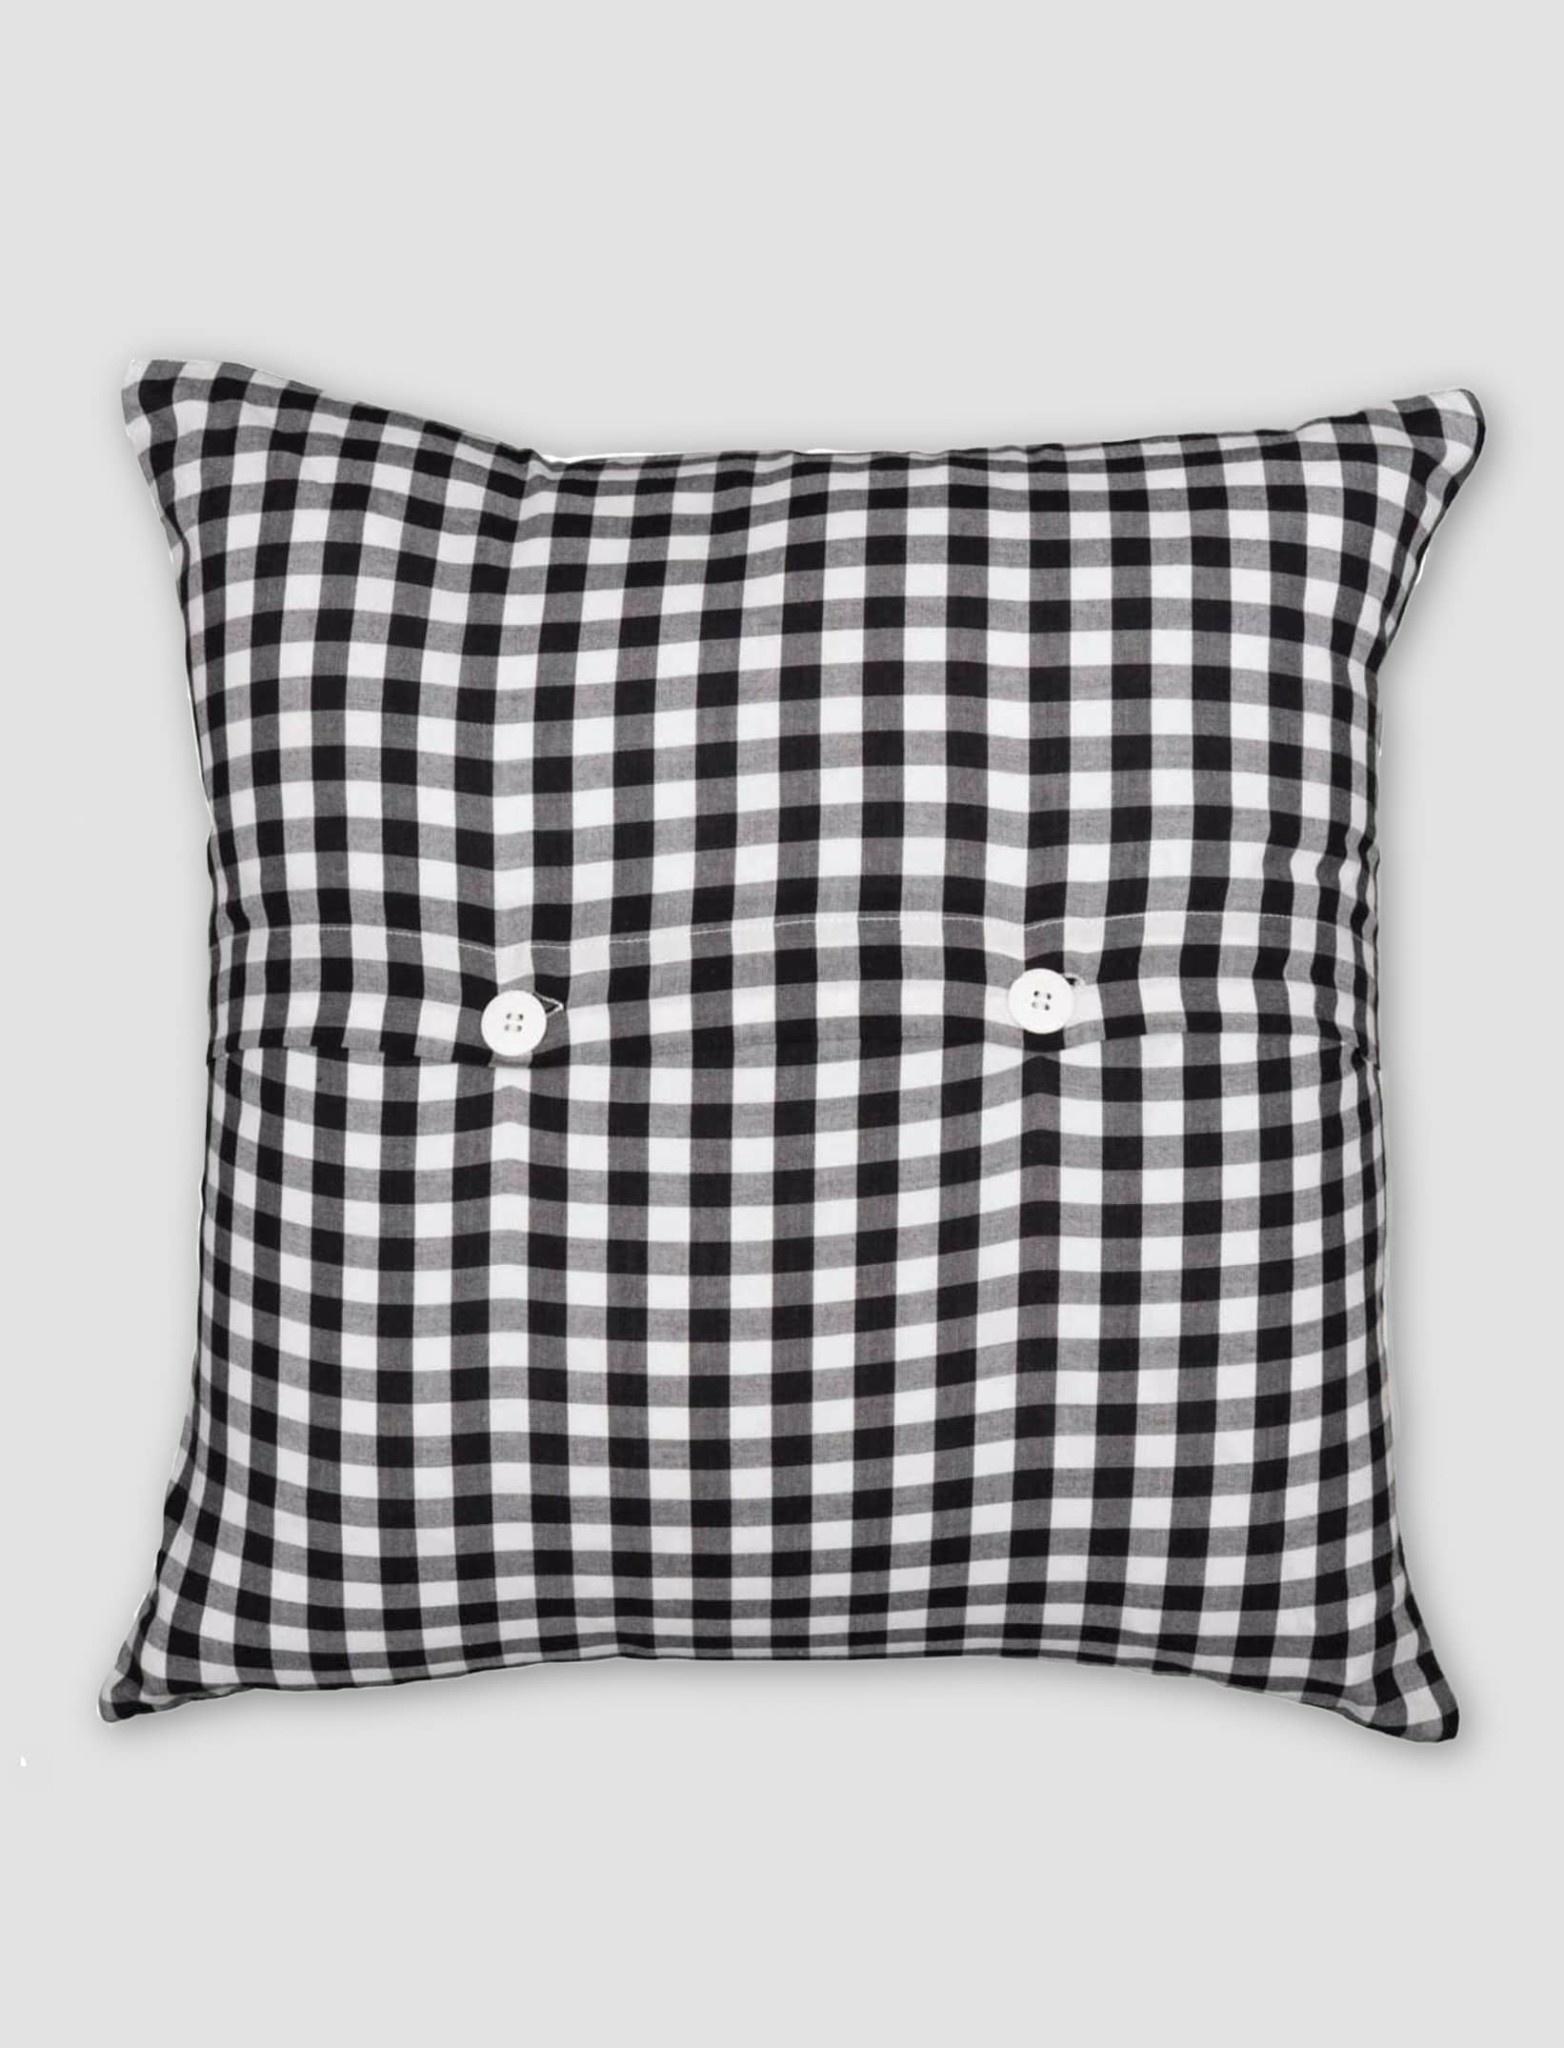 Nana's Farmhouse Emmie Deer Pillow